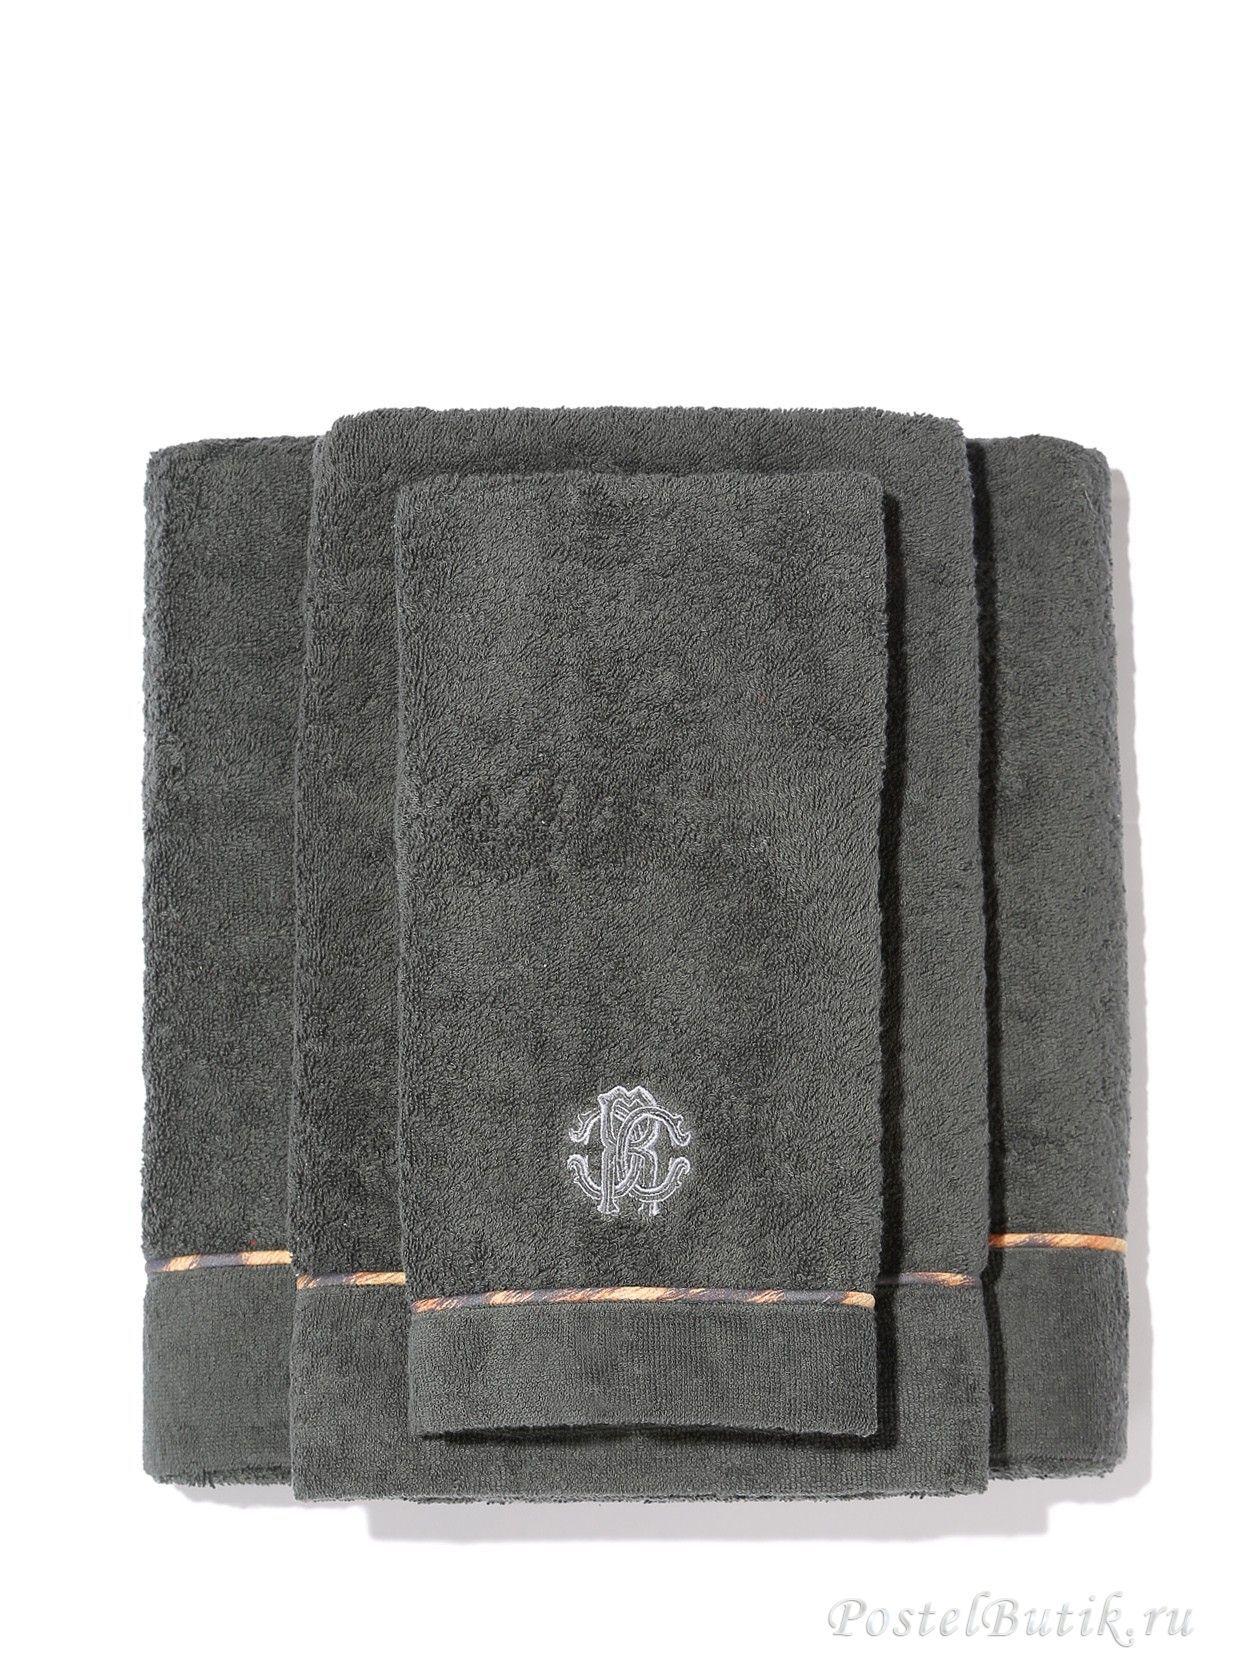 Наборы полотенец Набор полотенец 2 шт Roberto Cavalli Basic темно-серый elitnie-polotentsa-basic-temno-serie-ot-roberto-cavalli-italiya-nabor.jpg